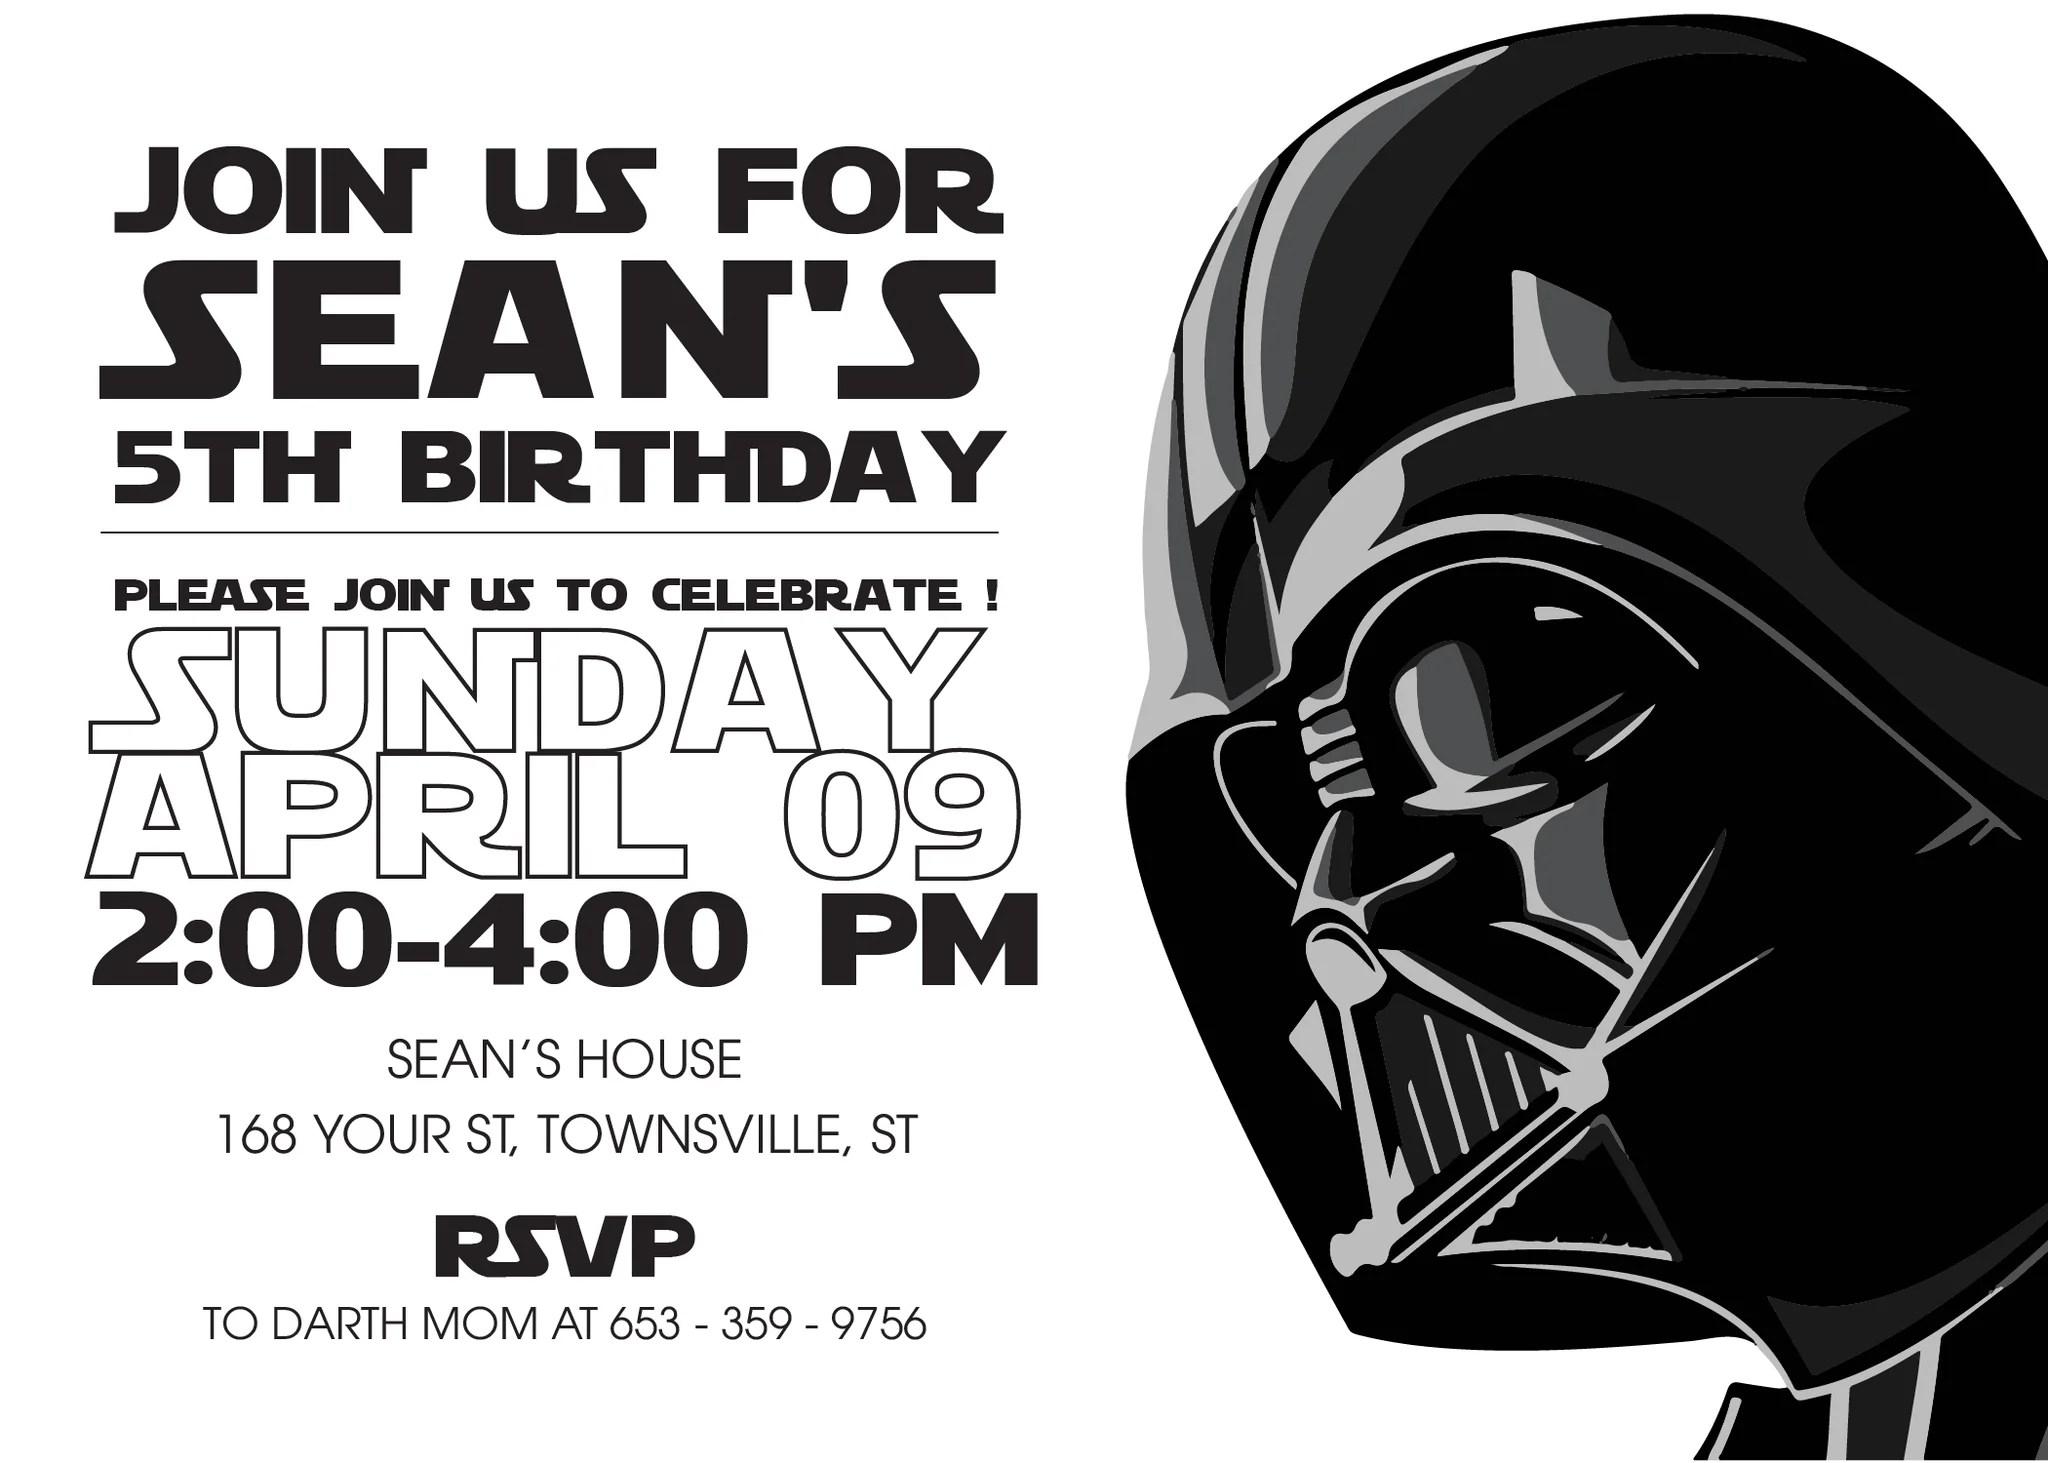 Unique Star Wars Star Wars Birthday Star Wars All Star Birthday Invitations Image Collection Star Wars Invitations Nz Star Wars Invitations Online baby Star Wars Invitations